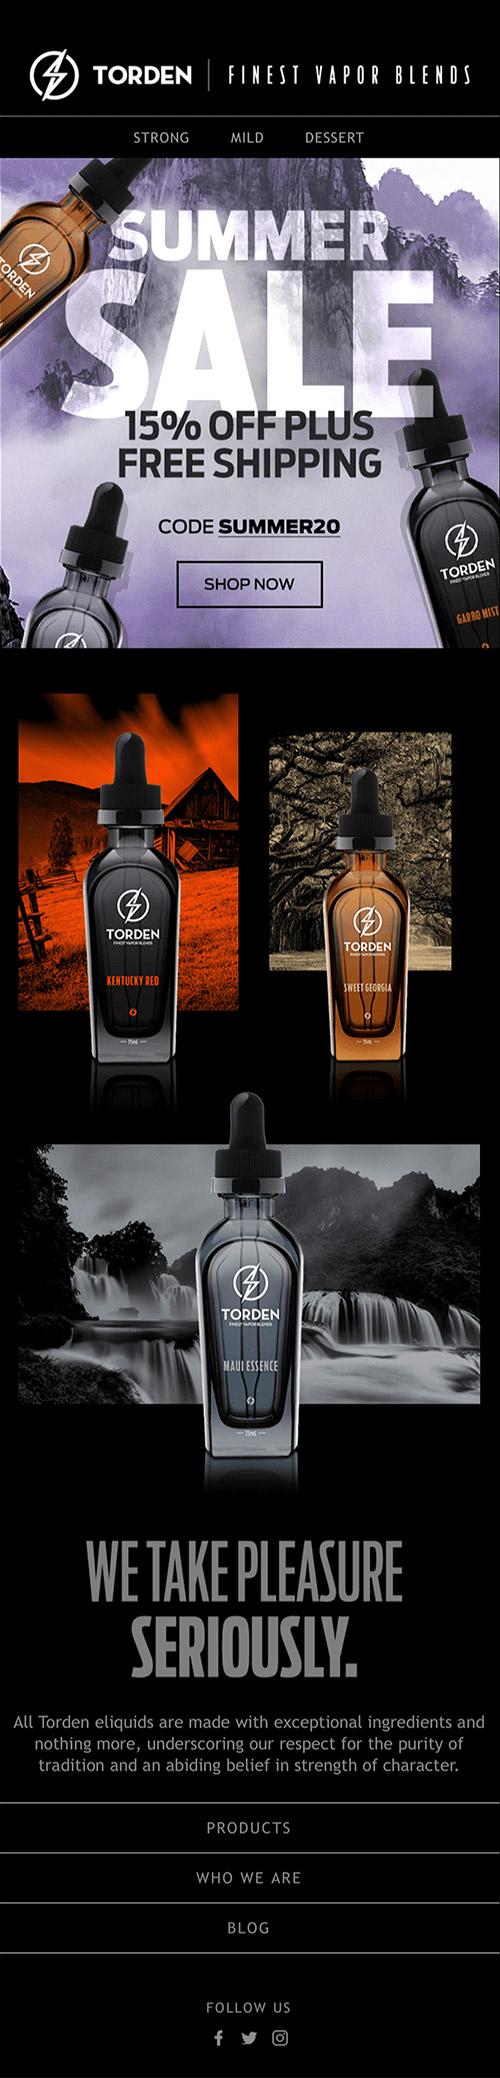 Klaviyo Agency Design of Vaping Promotional Email On A Black Background